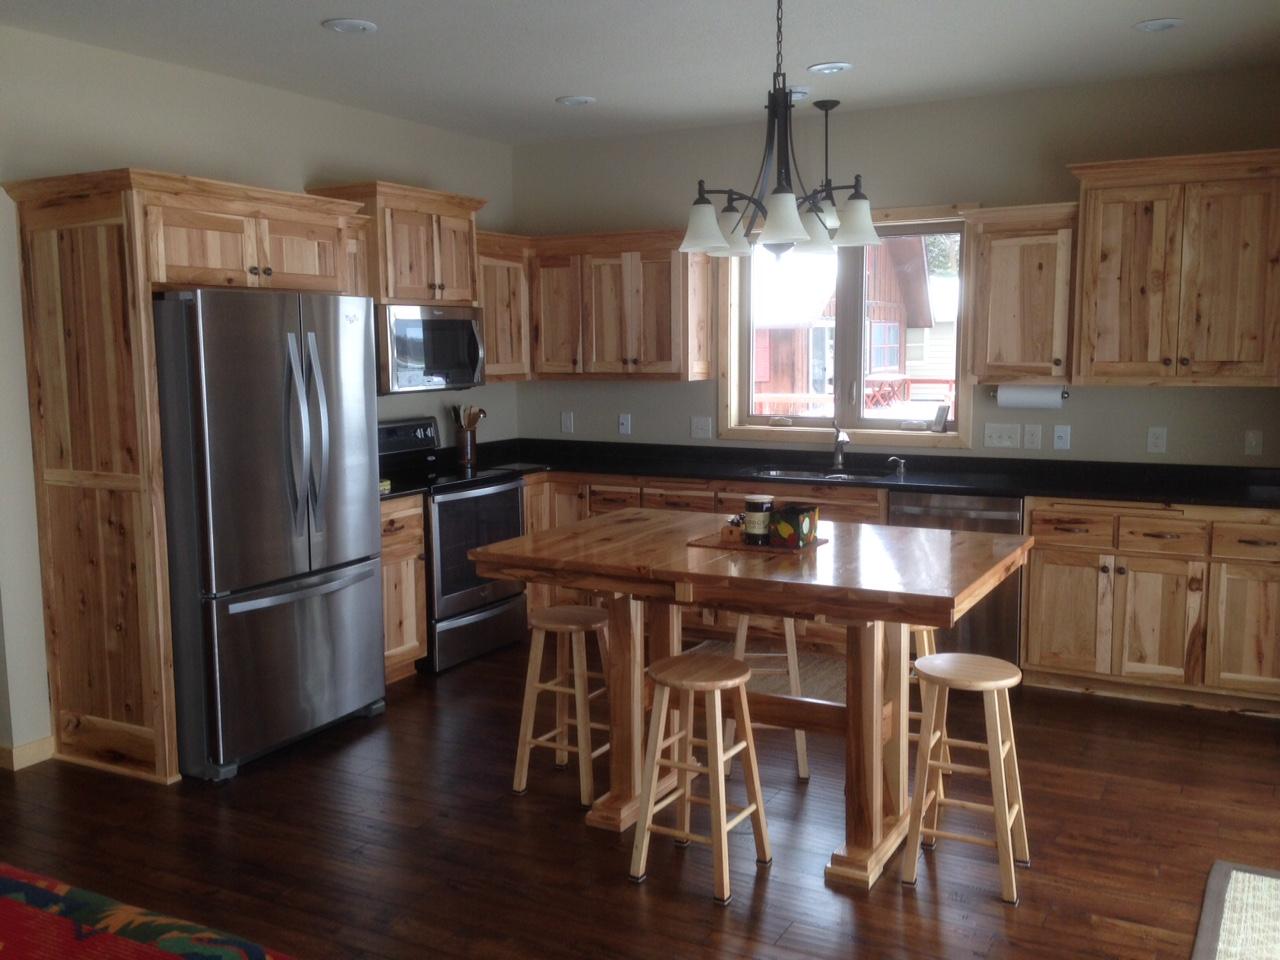 Mennonite Kitchen Cabinets – Kitchen Ideas